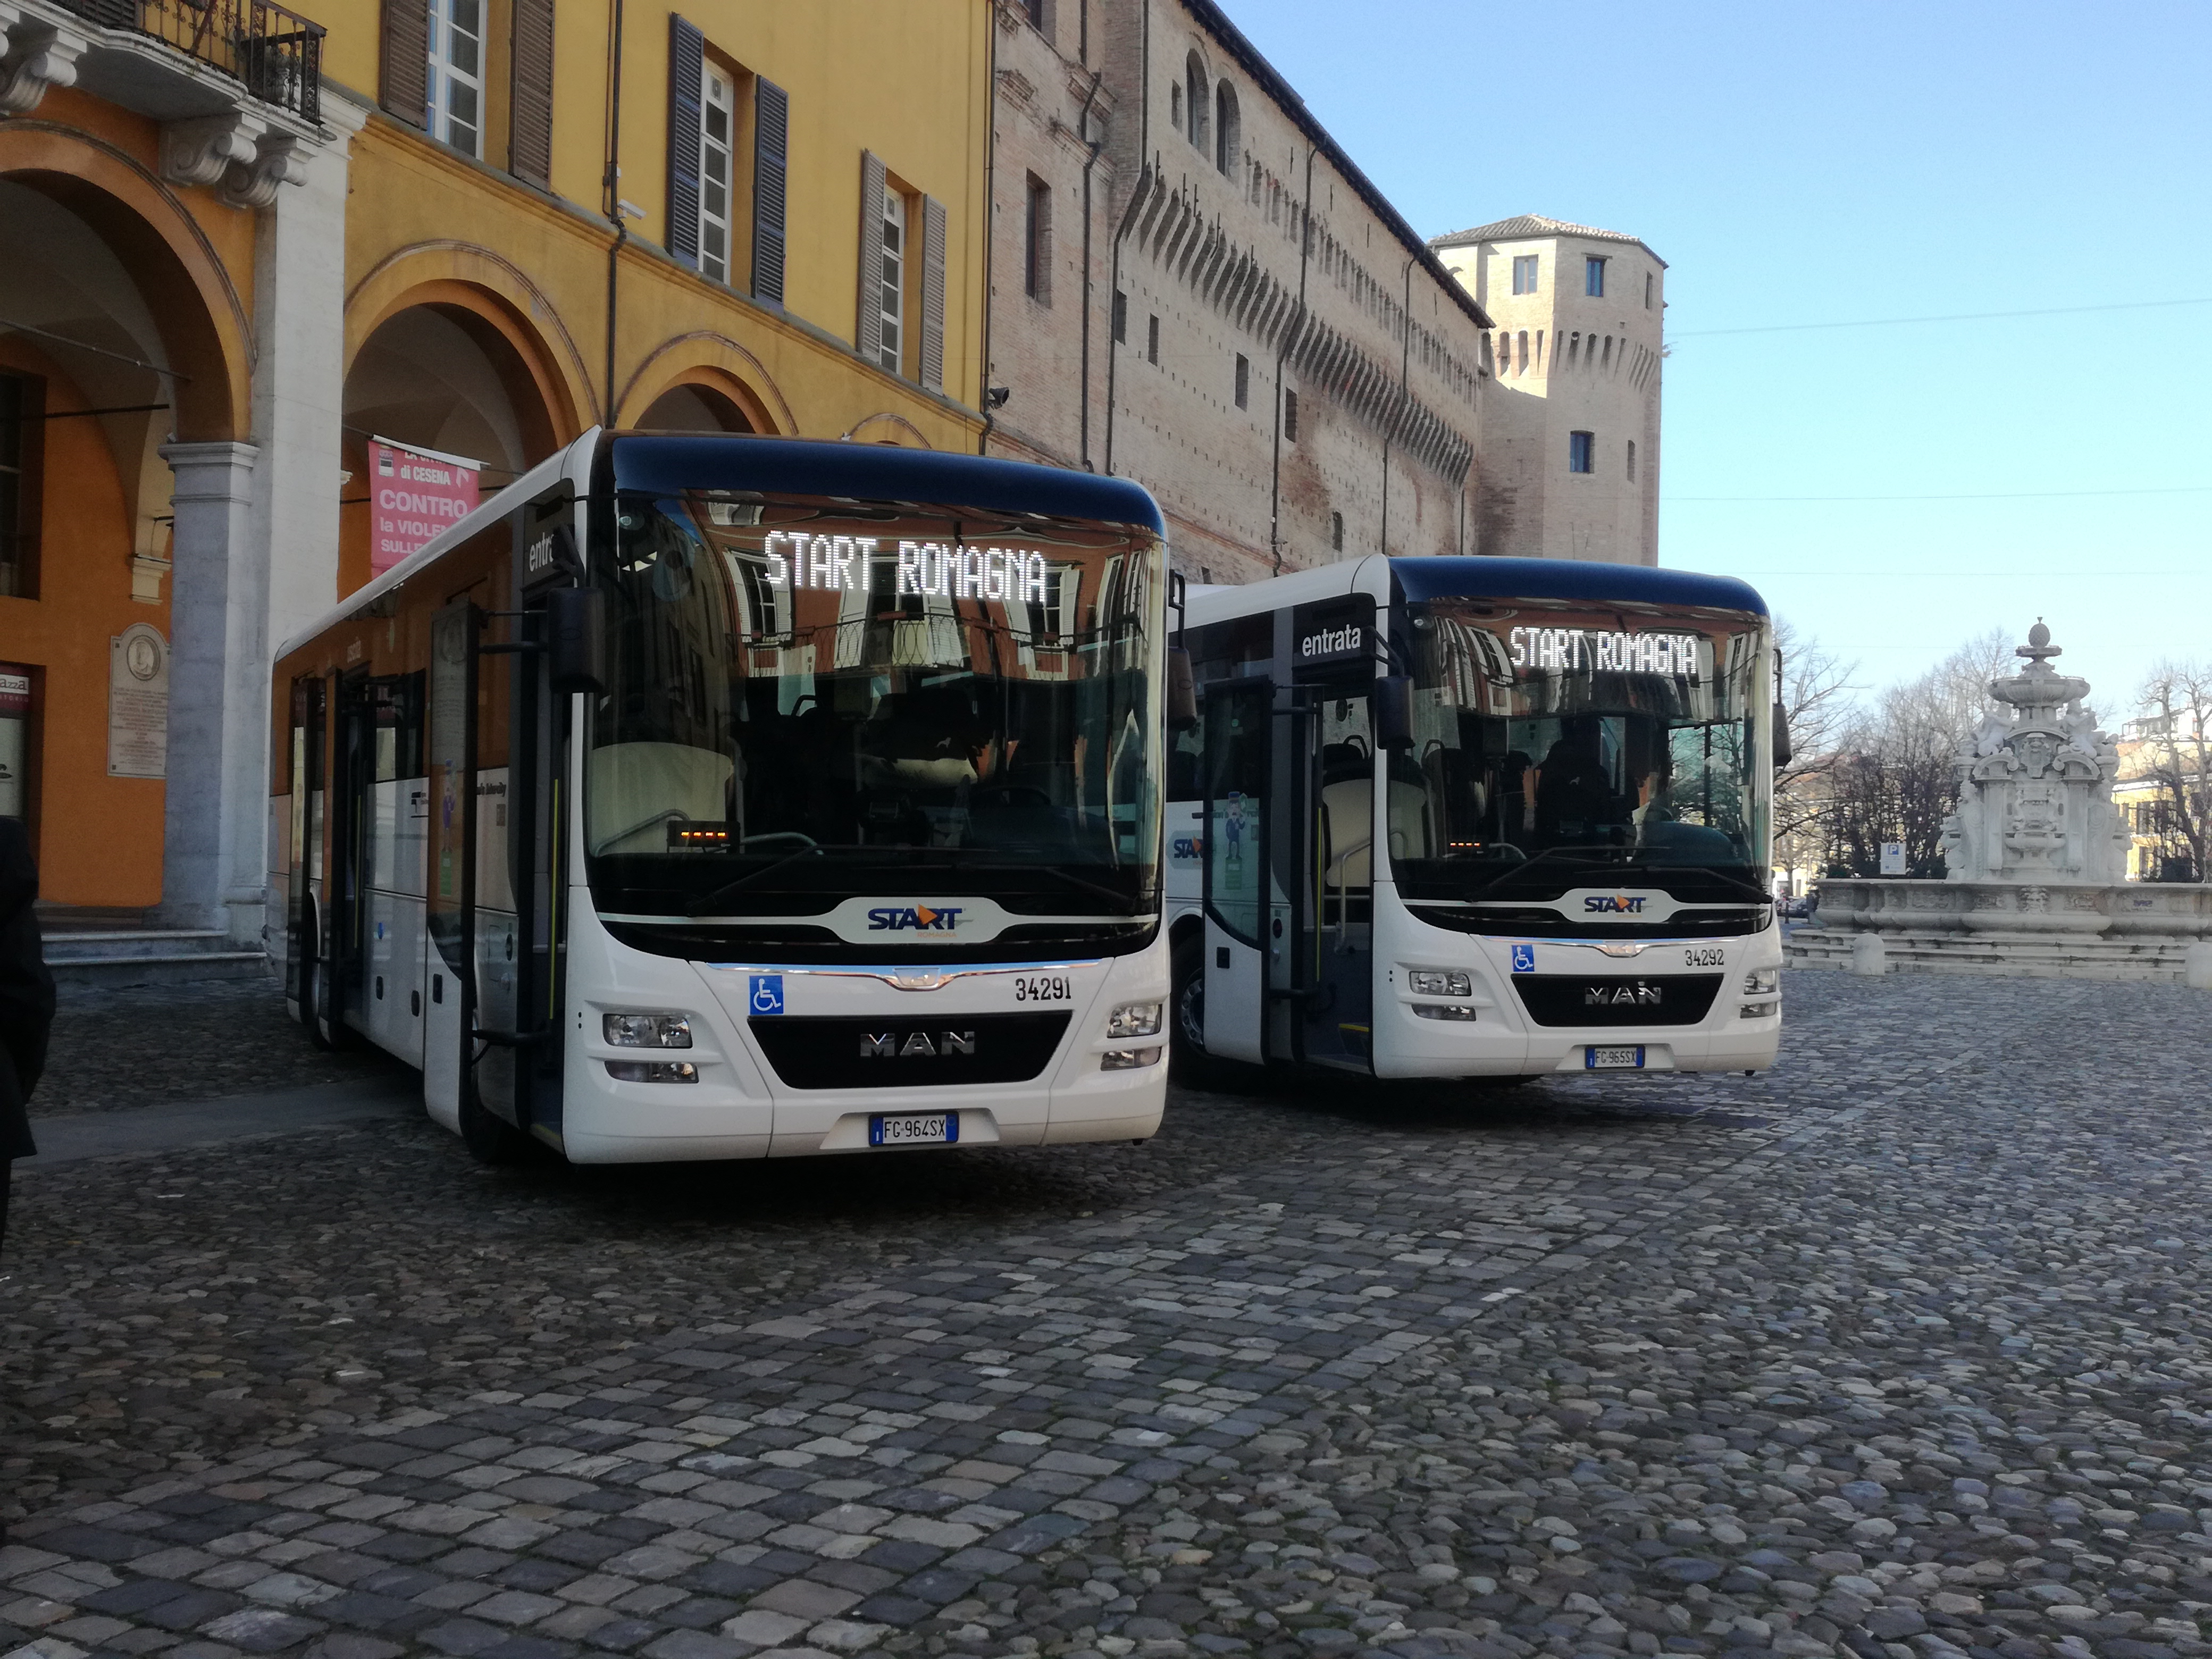 Mobility press emilia romagna - Orari bus cesena bagno di romagna ...